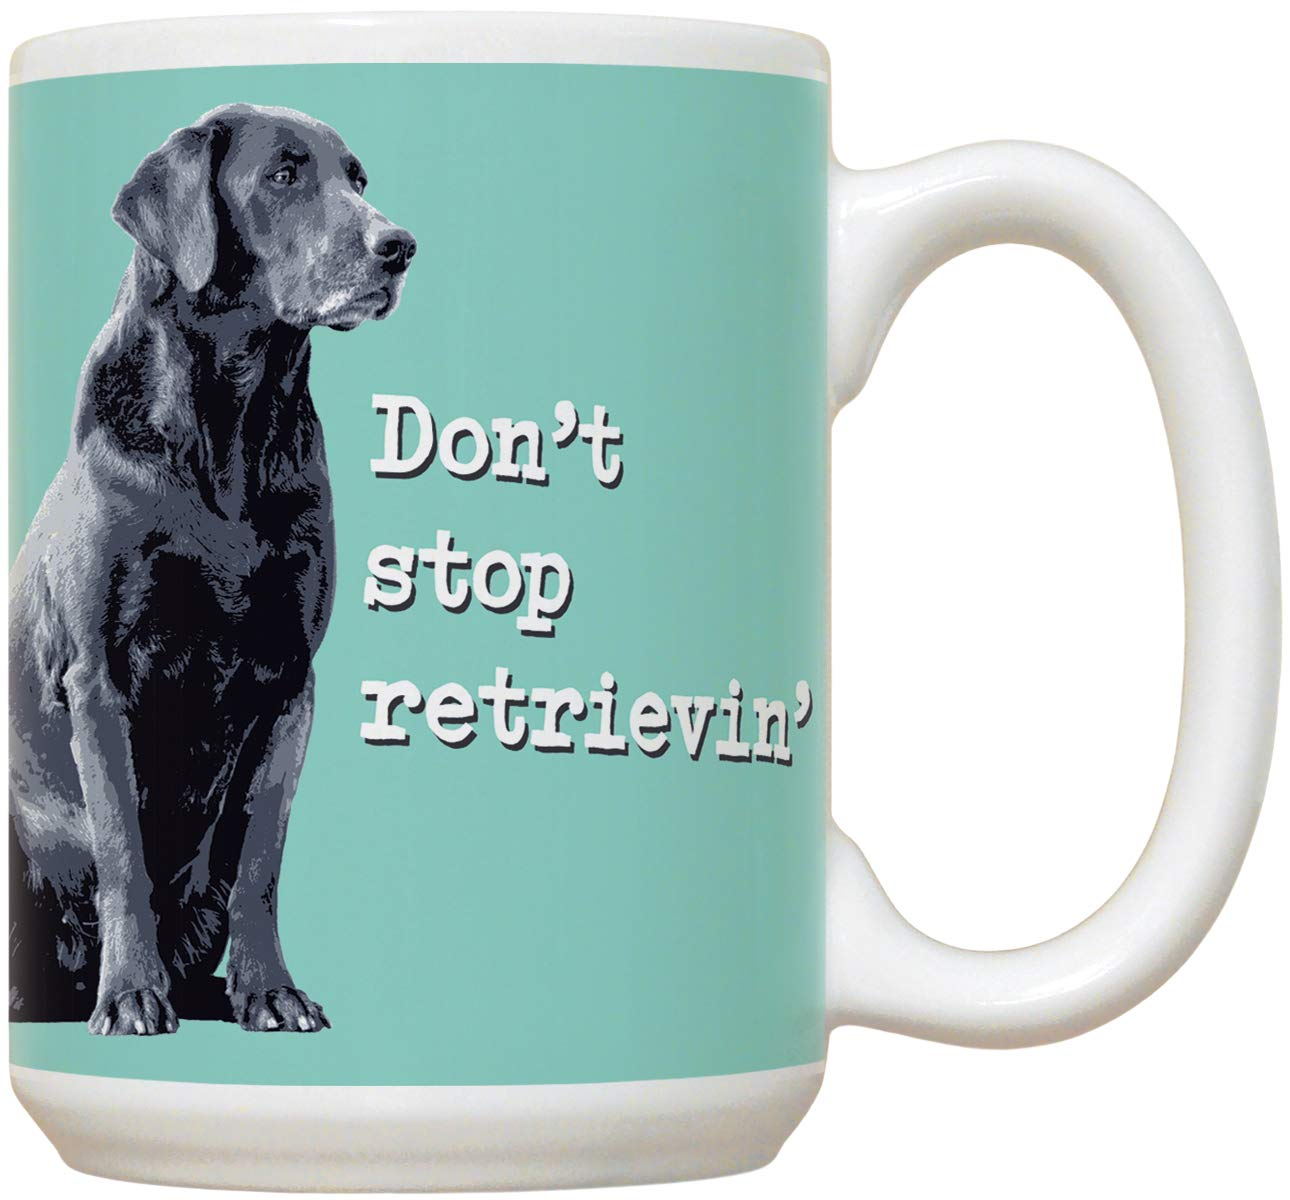 Design printed on both sides of mug Black Lab 15oz Large Ceramic Mug Dont Stop Retrievin